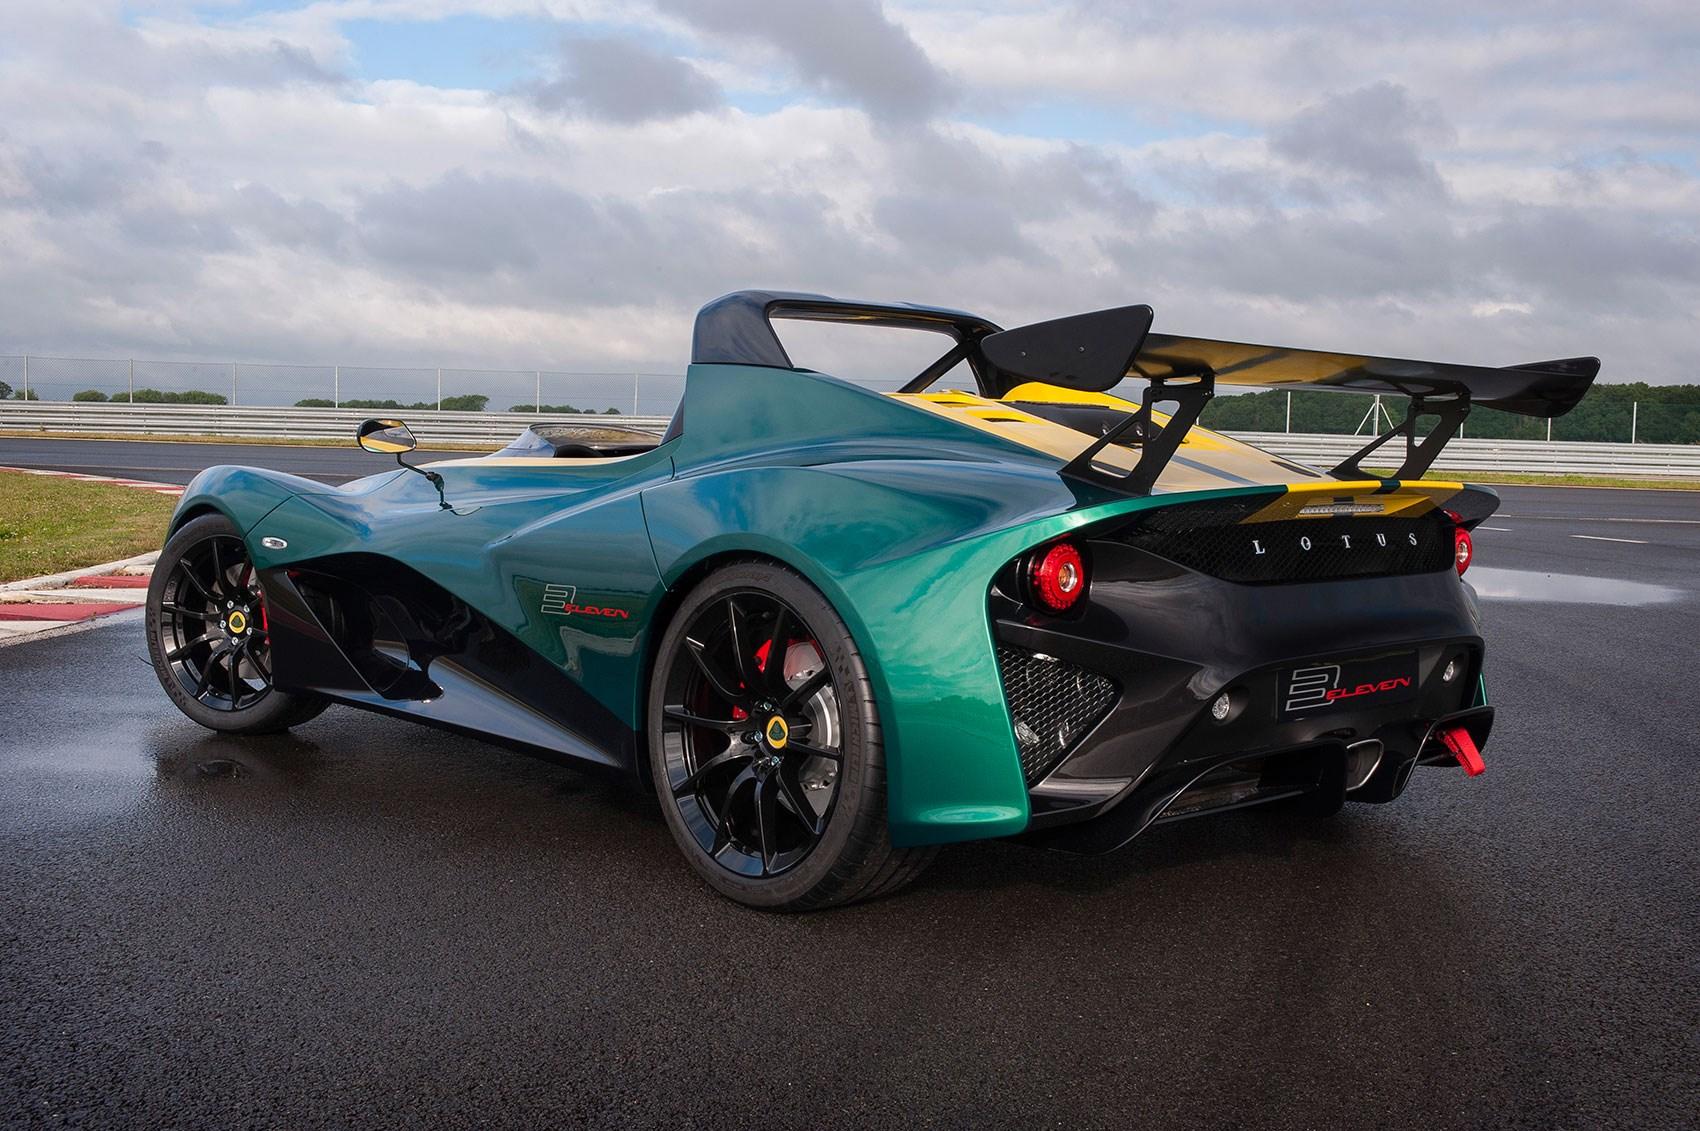 Lotus 3-Eleven unveiled: the fastest Lotus ever! | CAR Magazine